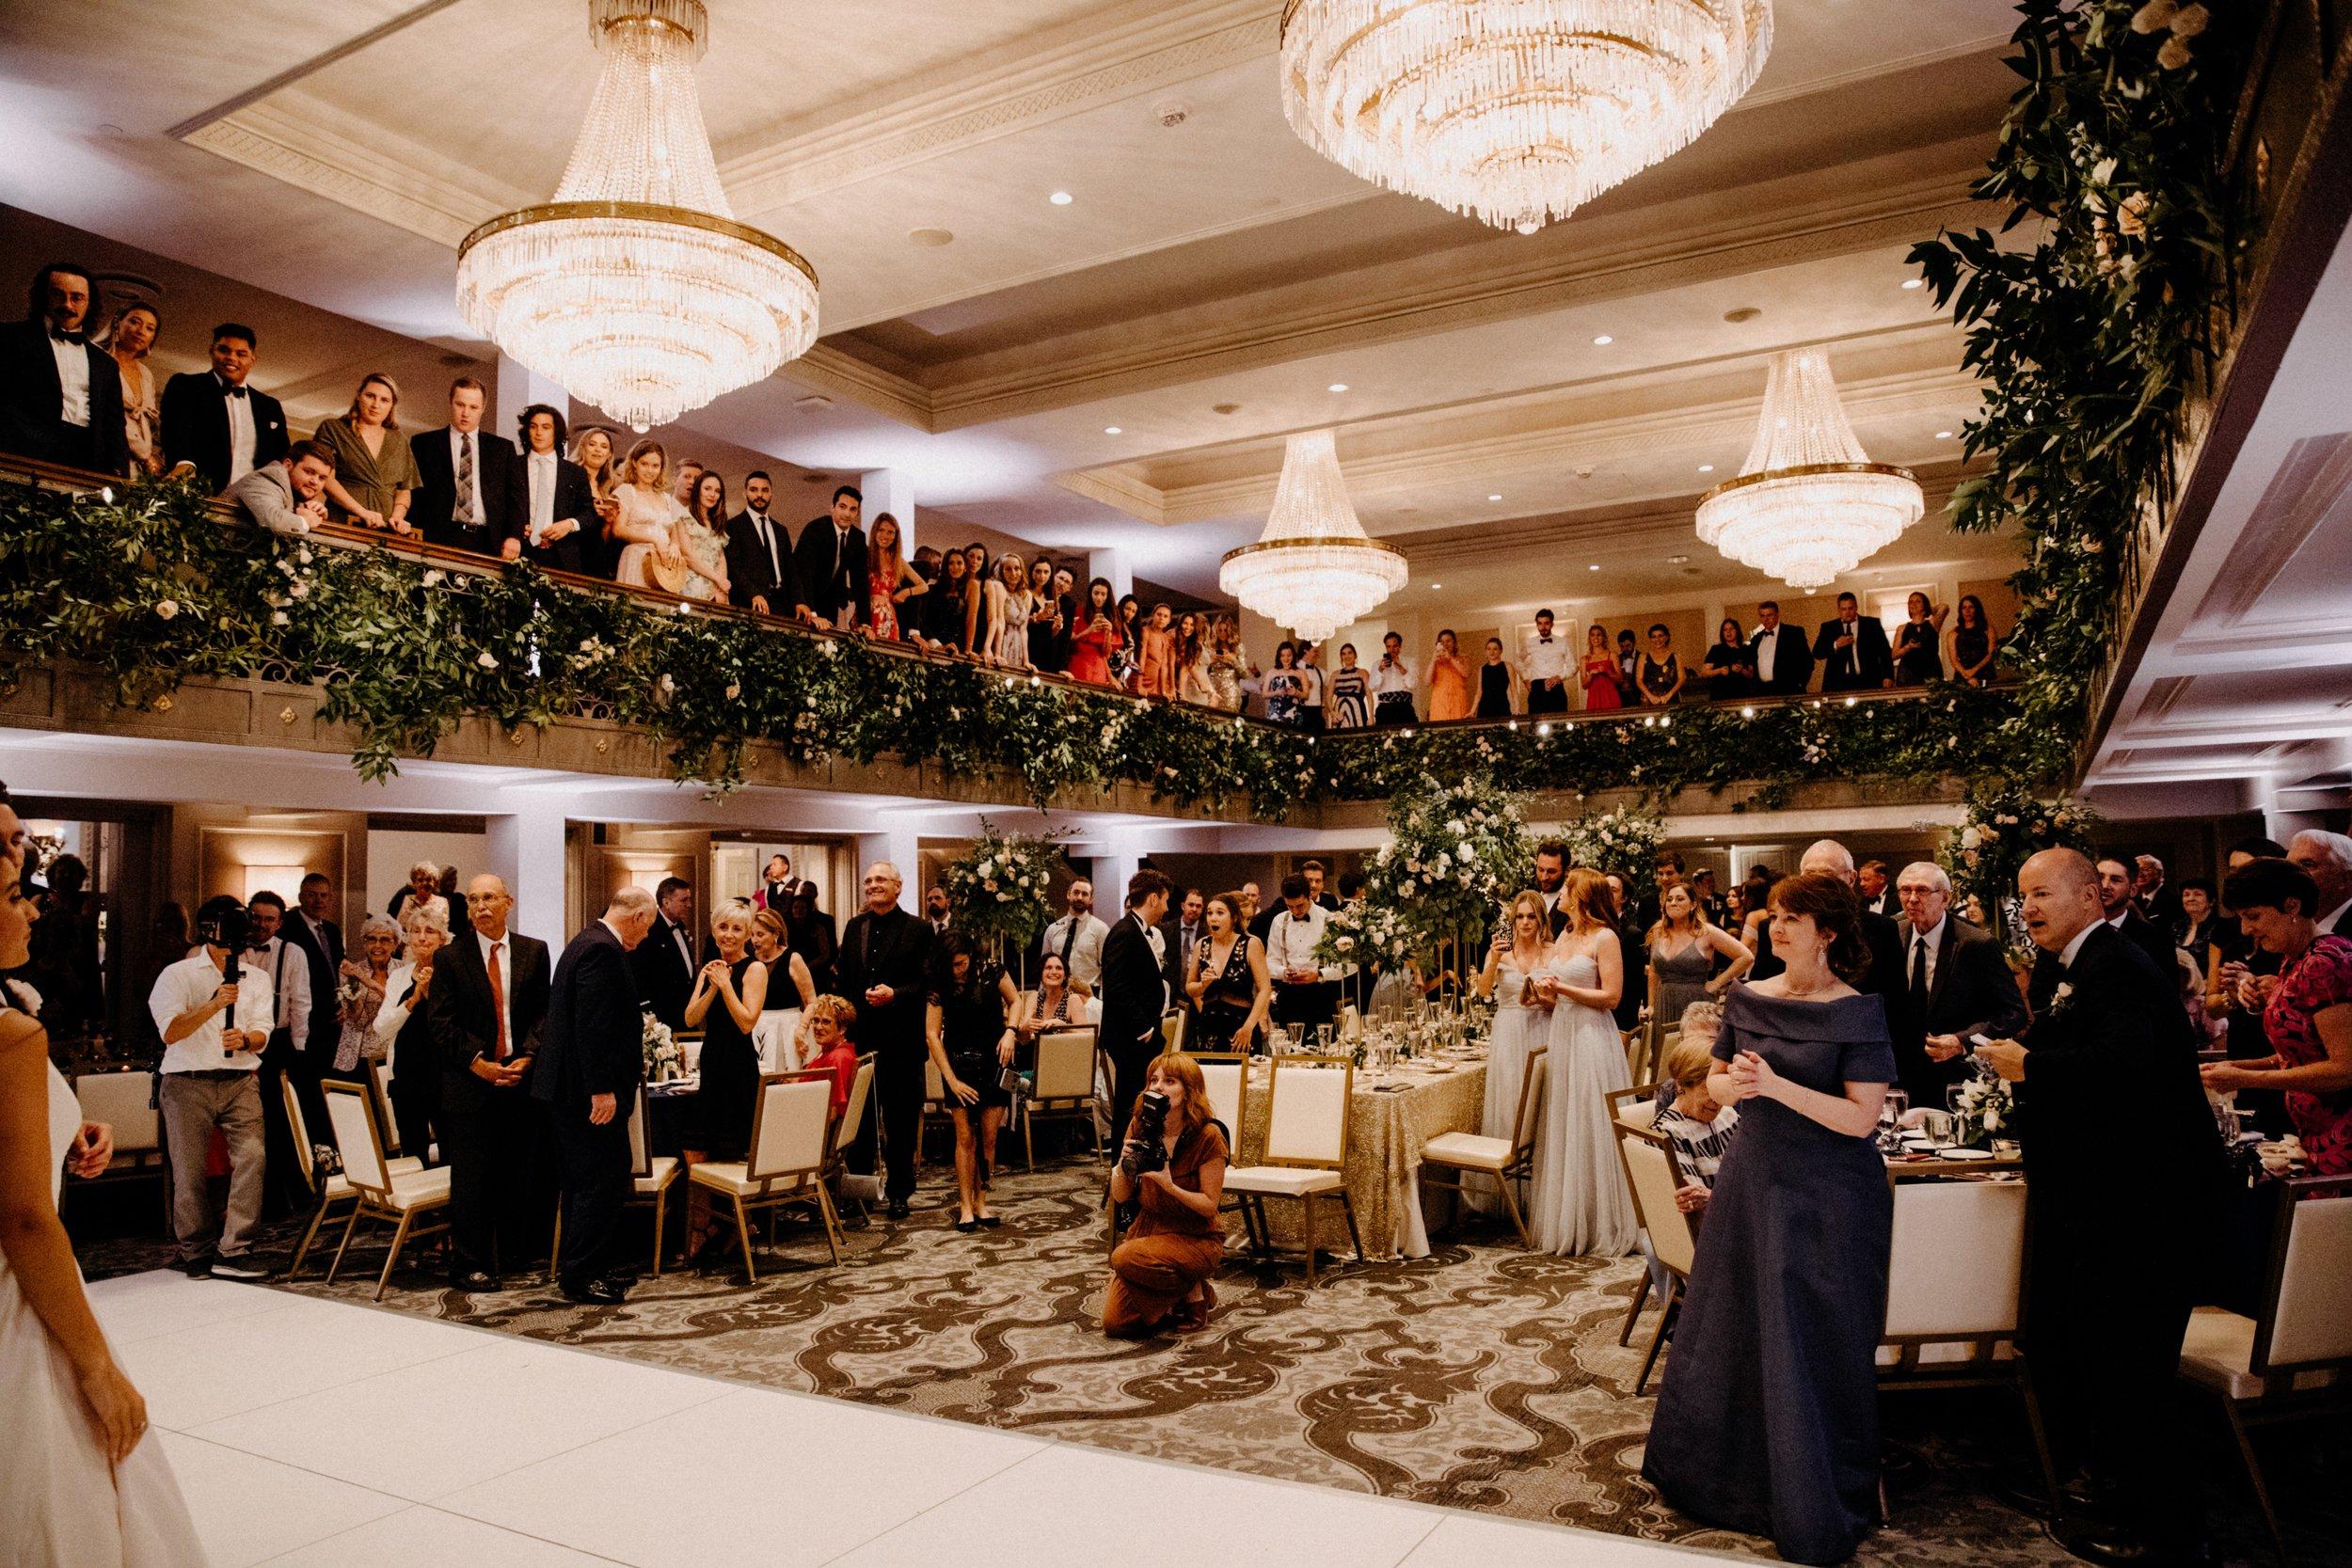 st-anthony-hotel-wedding-photography-10135san-antonio.JPG